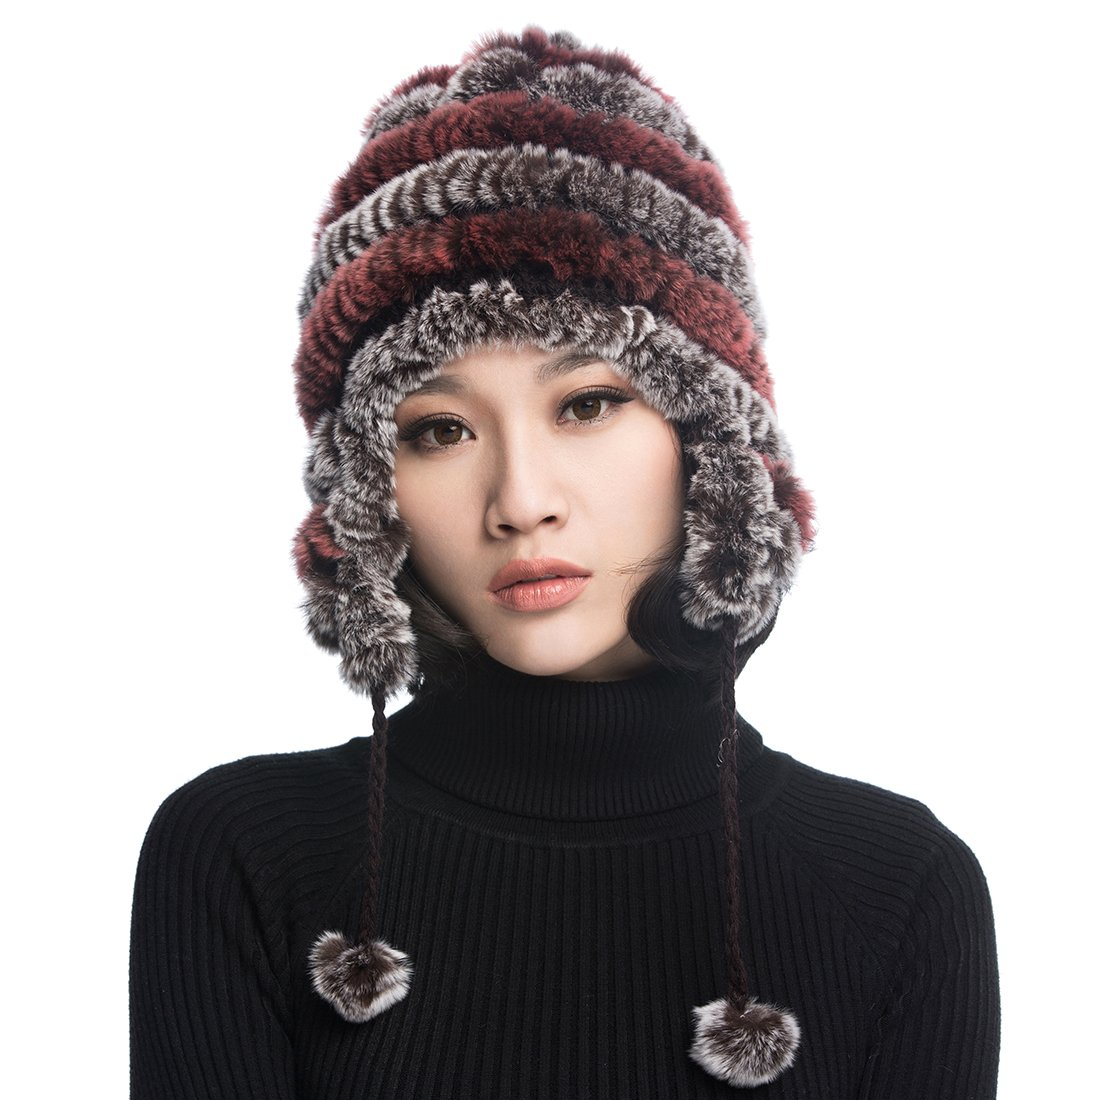 URSFUR  Women's Rex Rabbit Fur Hats Winter Ear Cap Flexible Multicolor (Coffee & Pink)